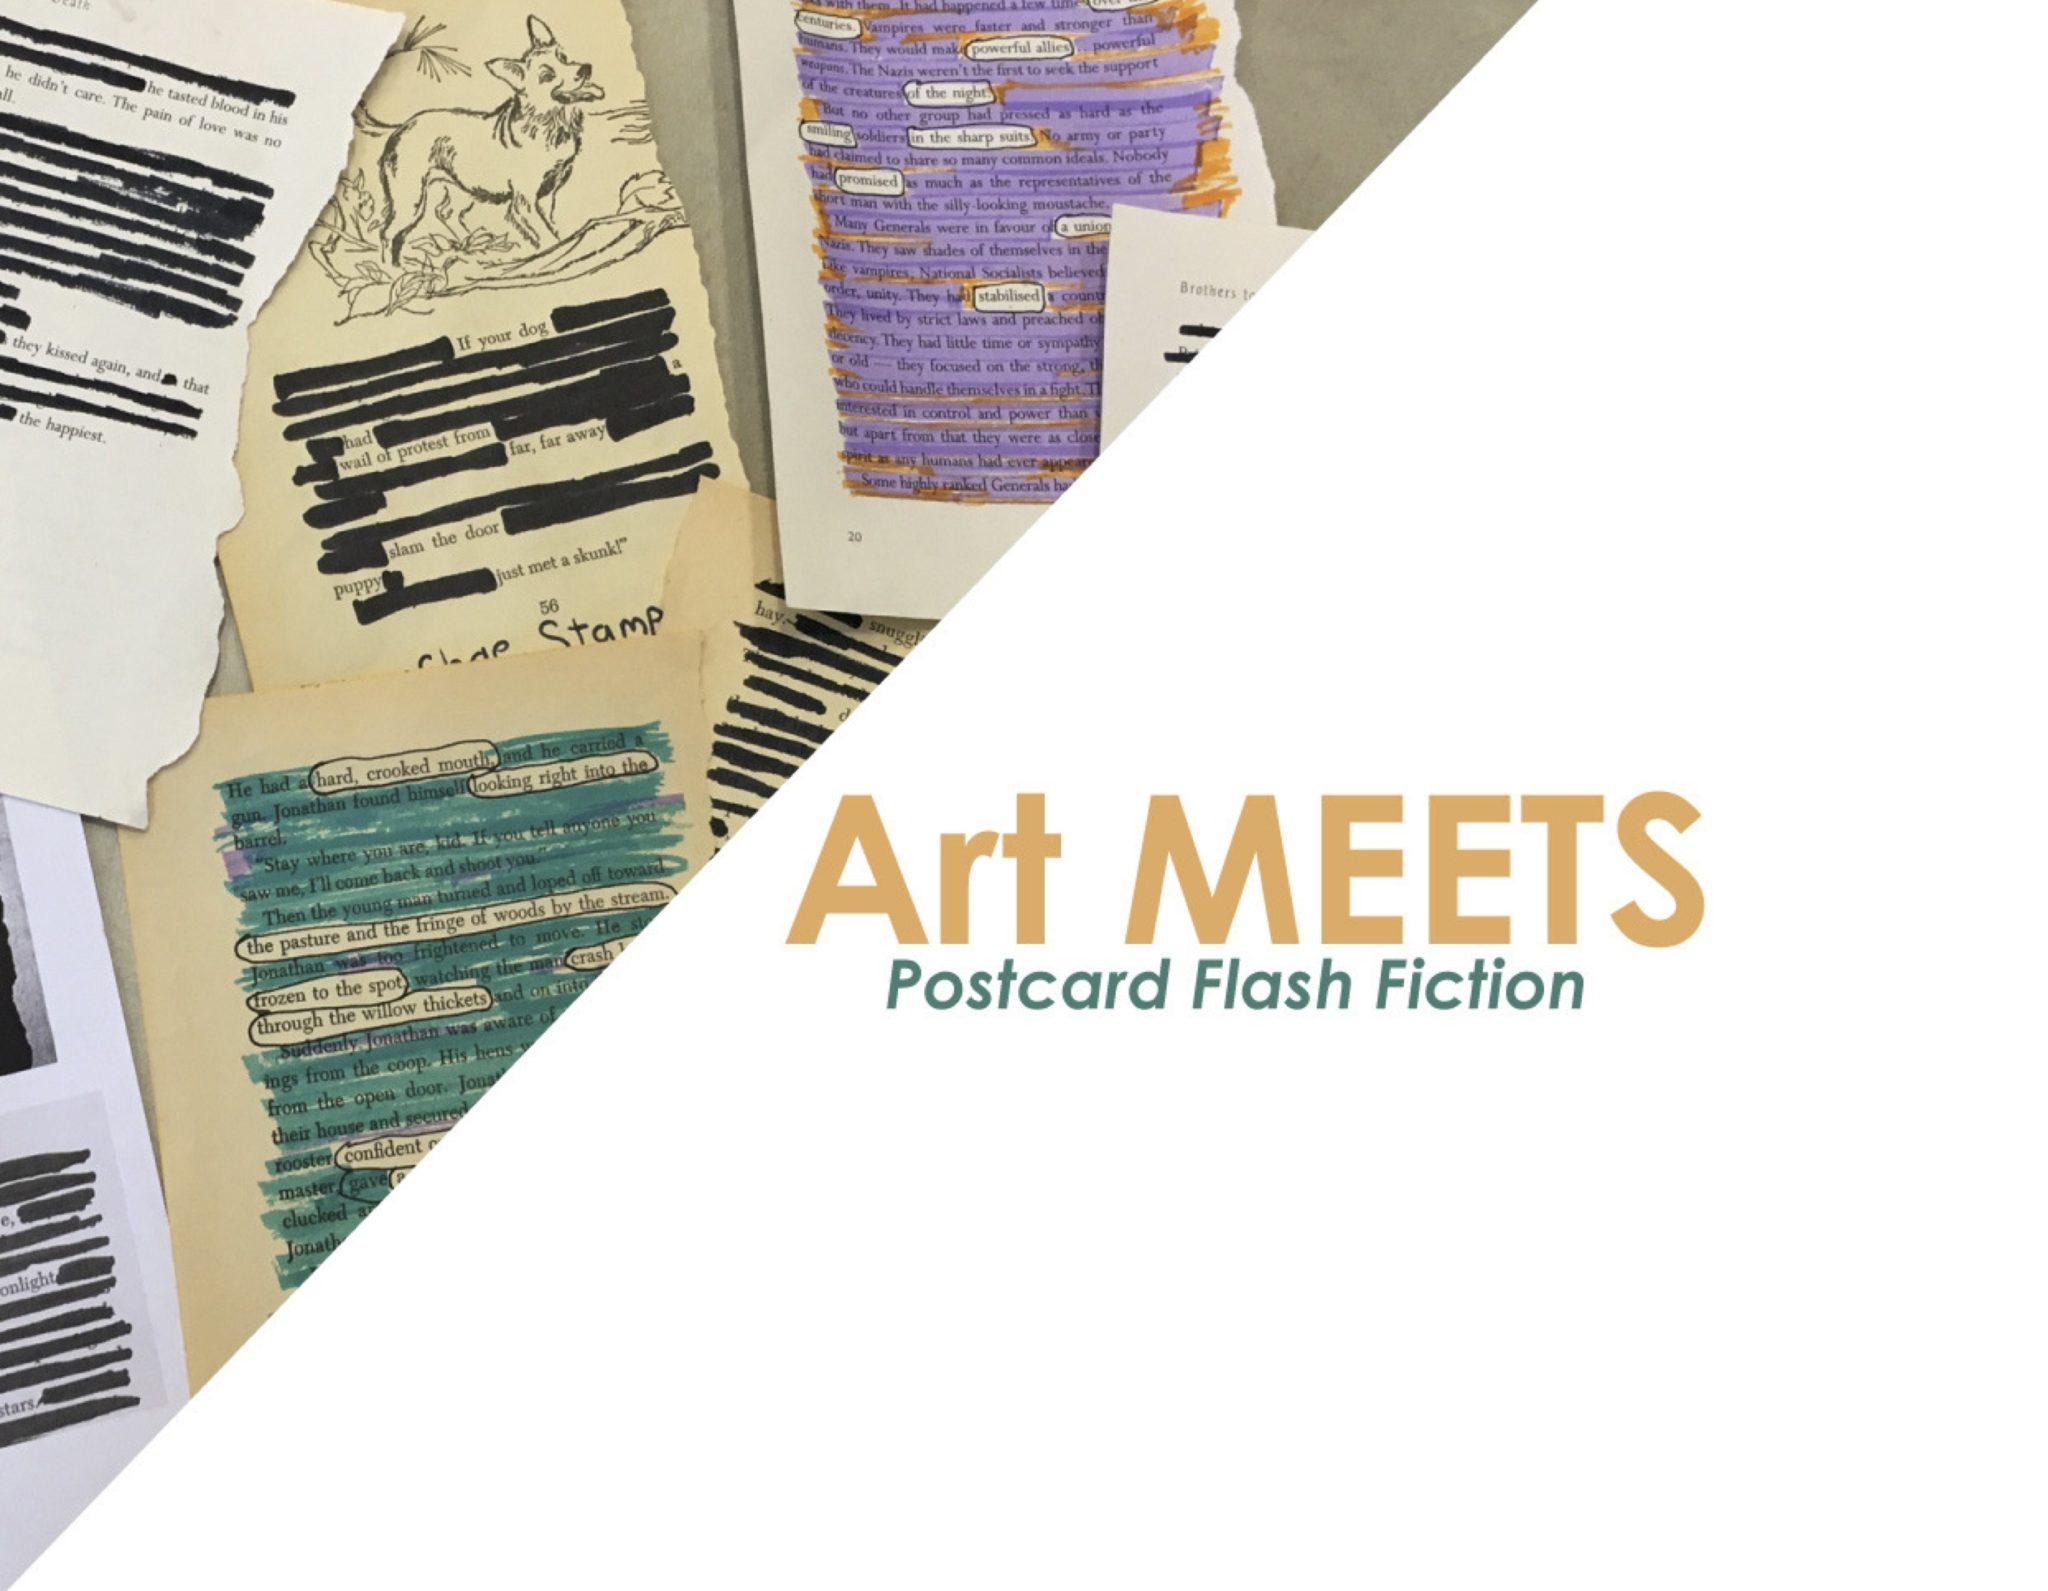 Art MEETS: Postcard Flash Fiction